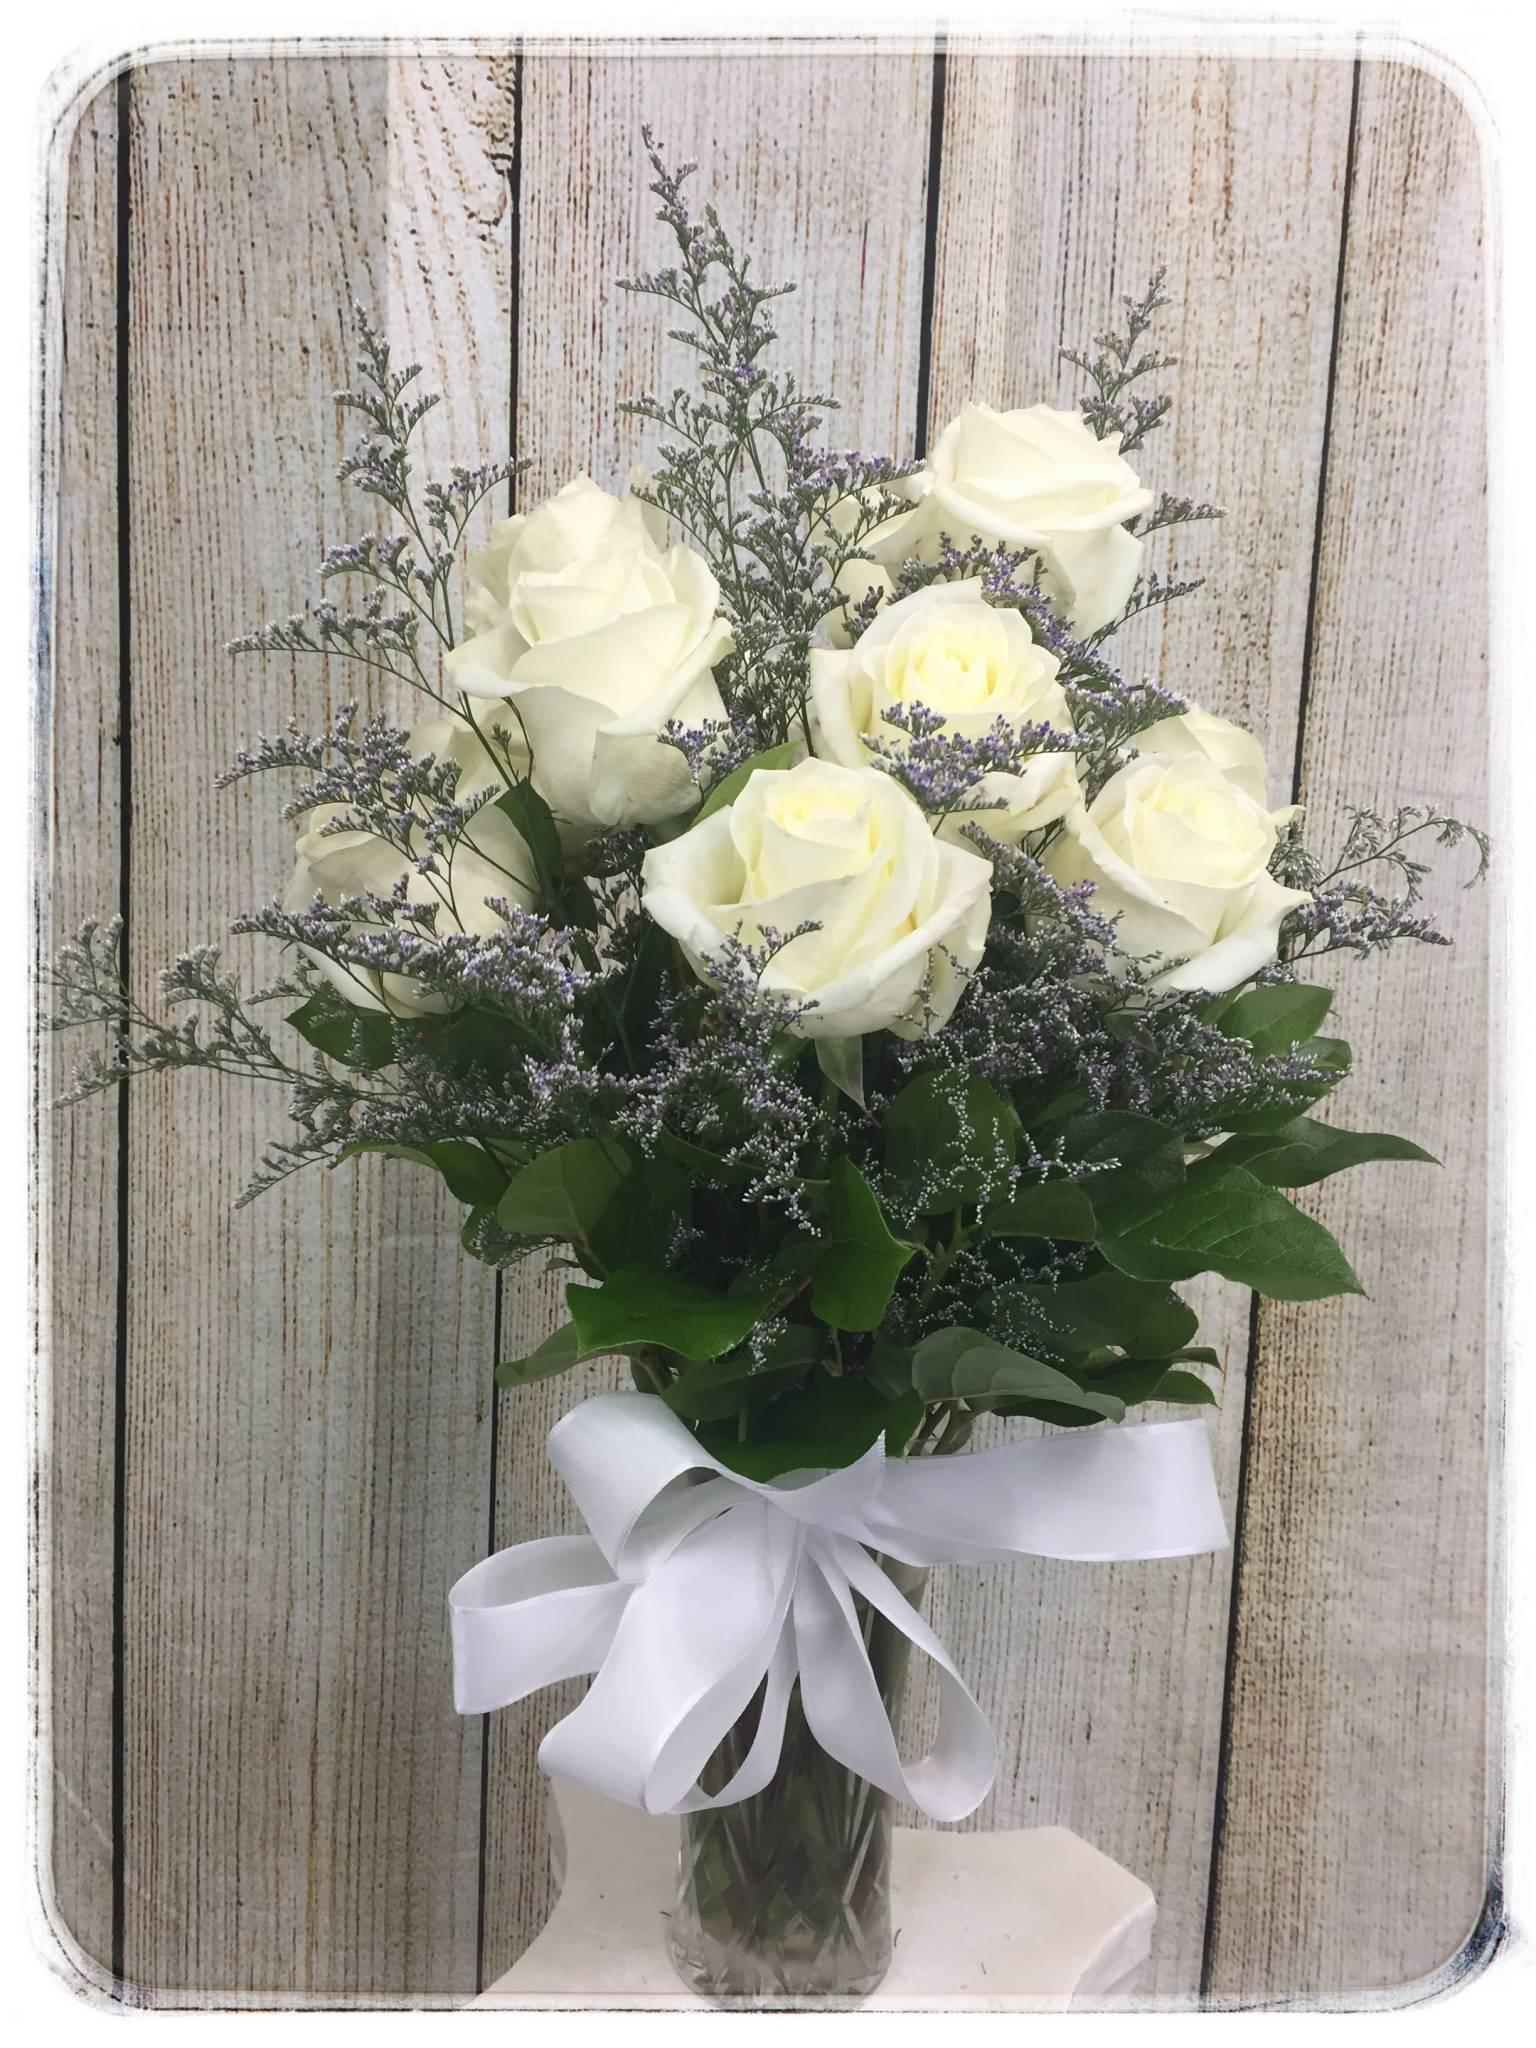 Arctic white roses petals flower shop florist white rose flower arrangement by petals flower shop florist mightylinksfo